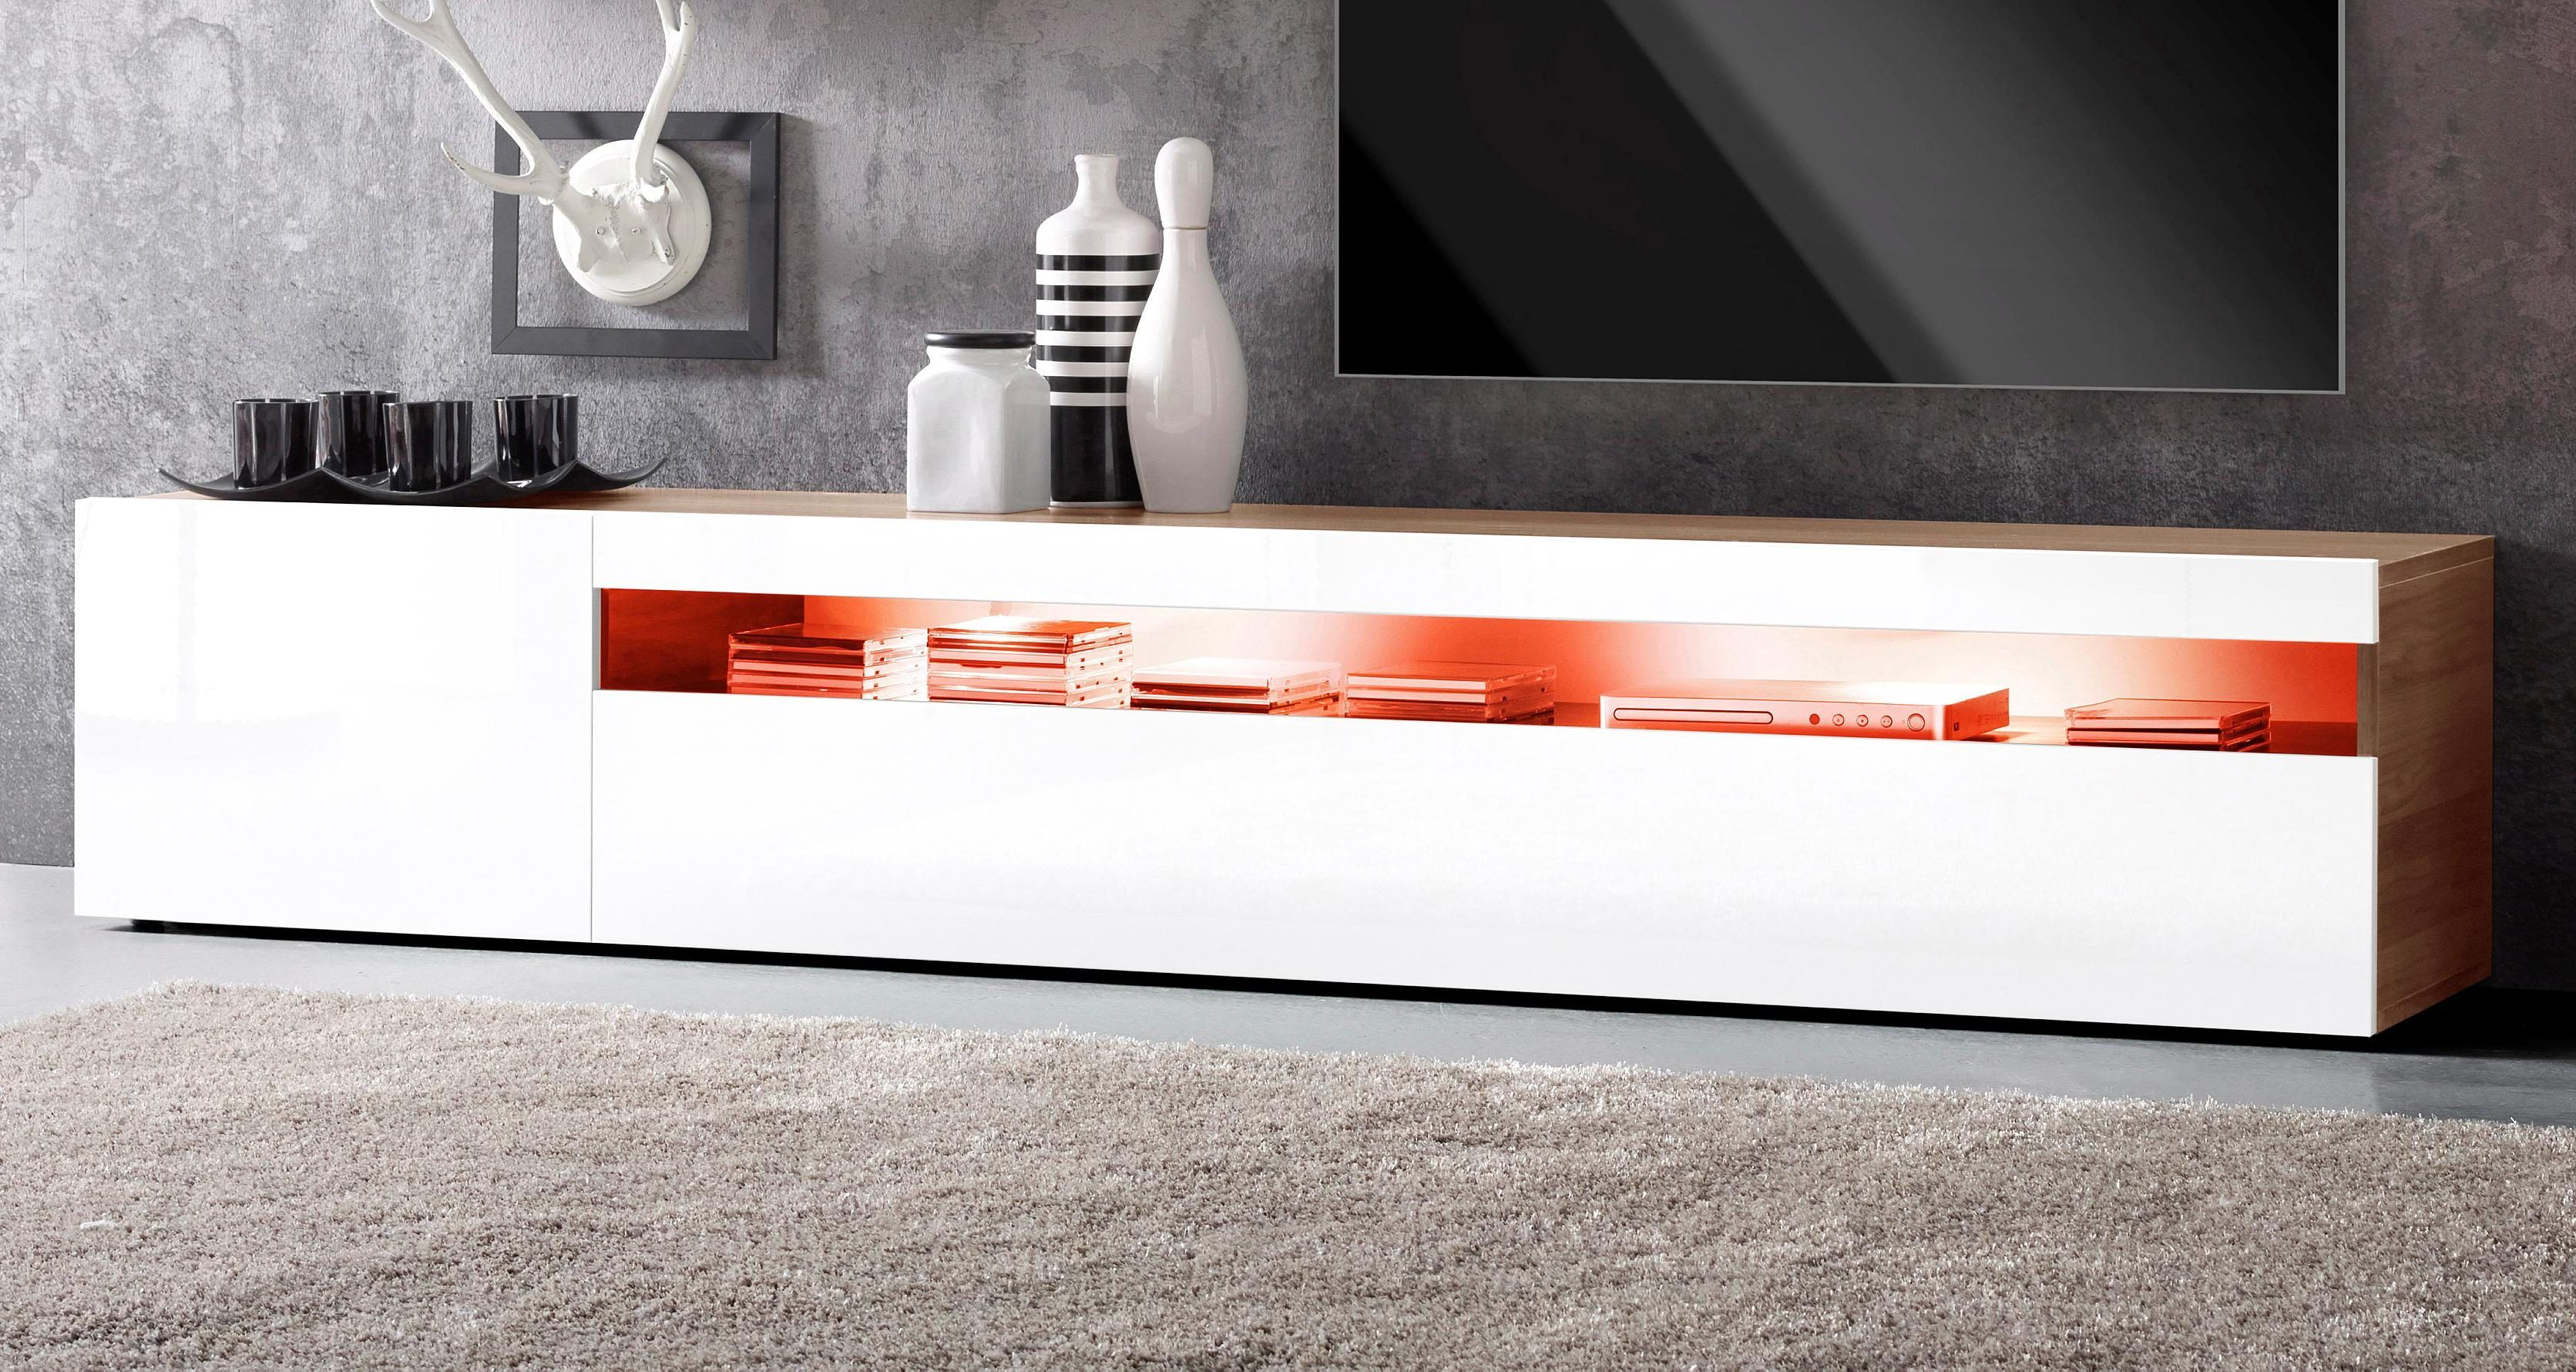 Wohnzimmer Hochglanz ~ Tecnos xxl lowboard braun hochglanz fronten fsc® zertifiziert